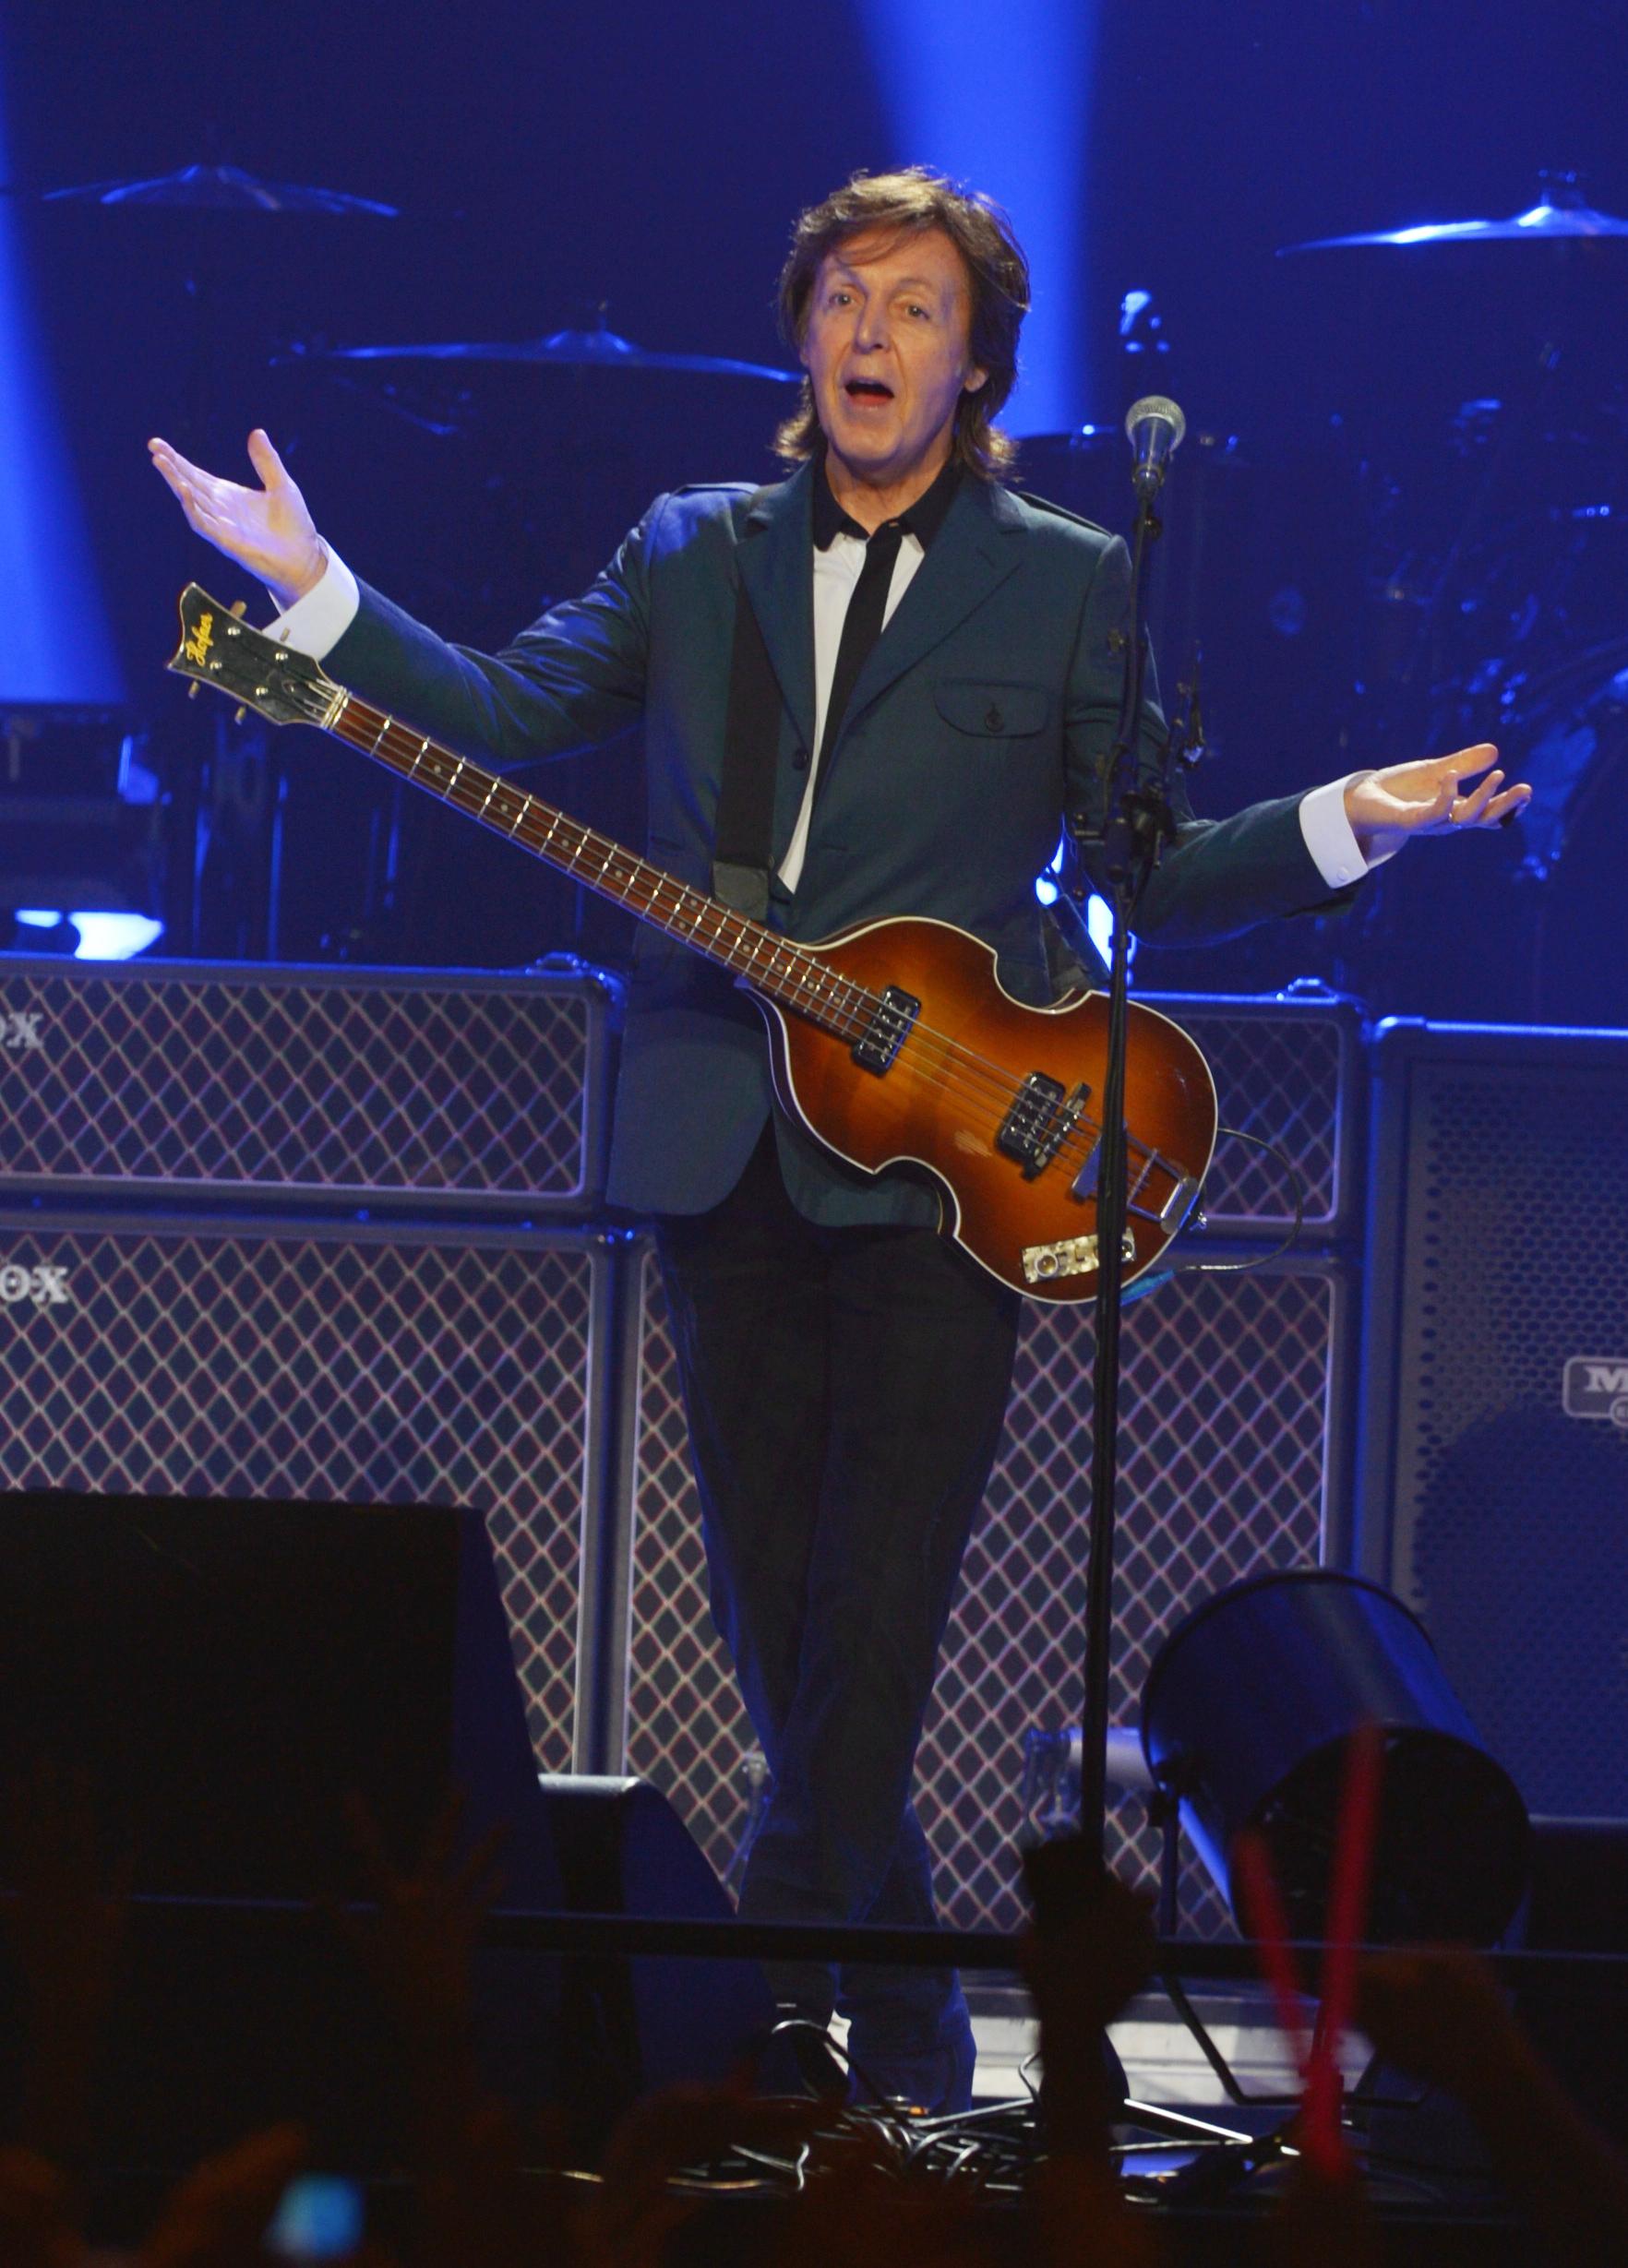 Paul McCartney on Beatles in History Books: 'Unbelievable, Man!'